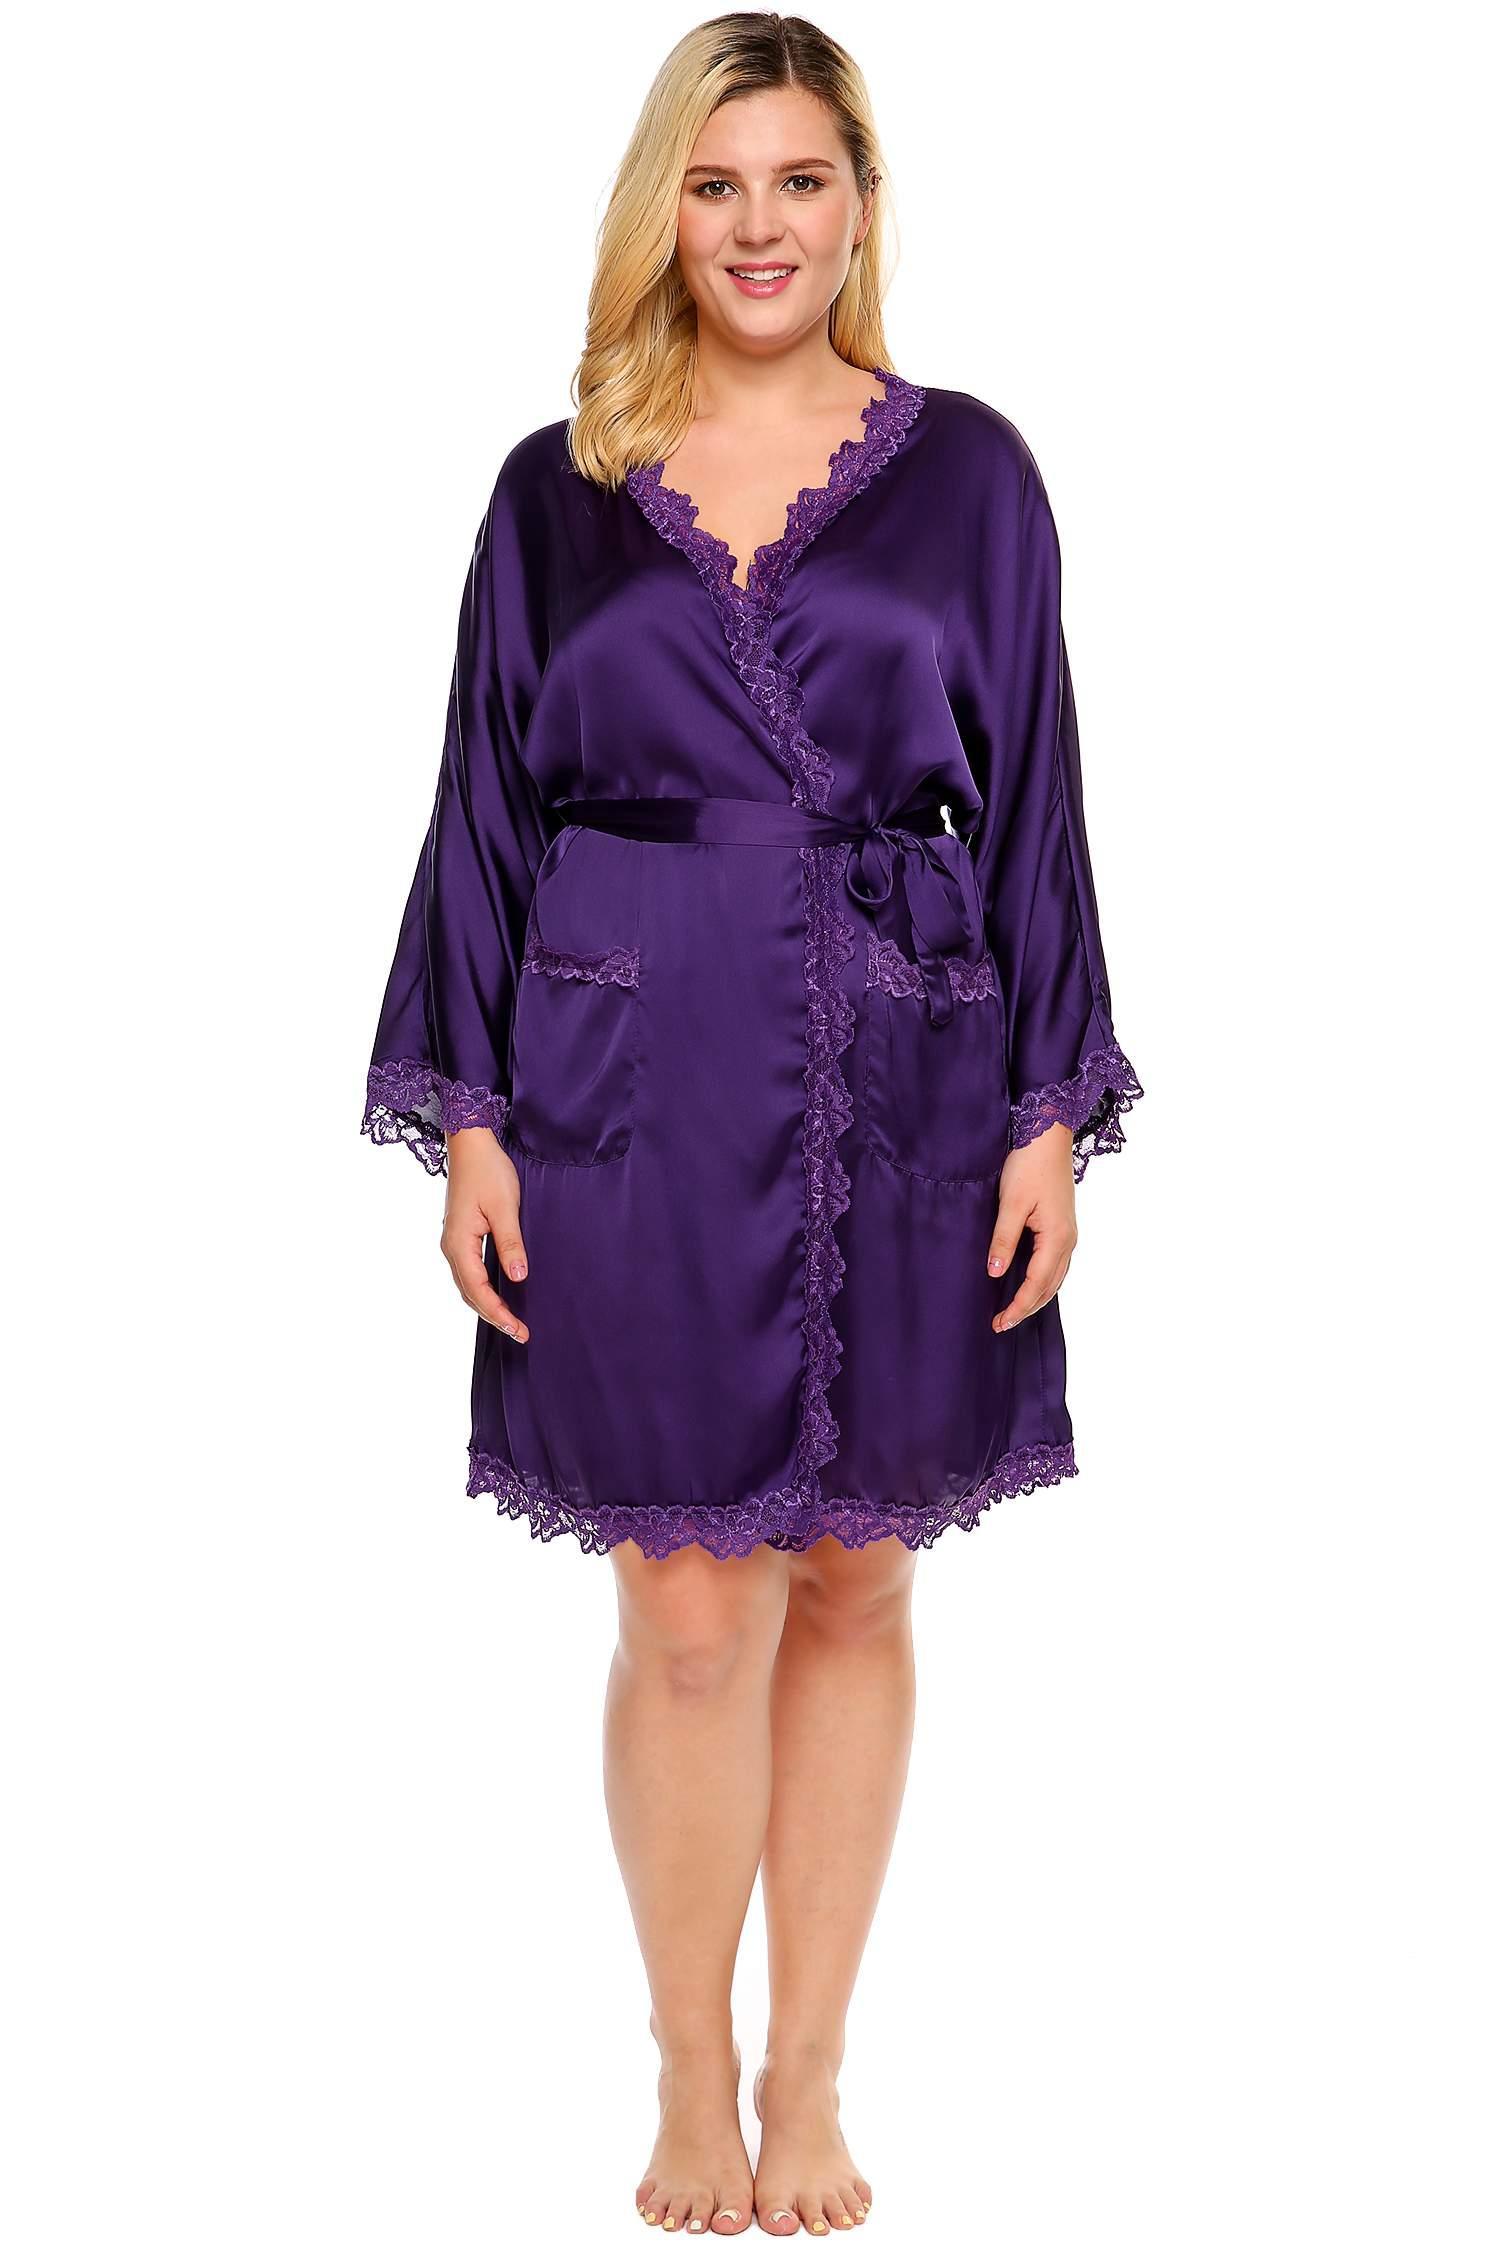 c55991f6b9 Purple Plus Size Lace Trim Satin Belted Long Sleeve Kimono Robe